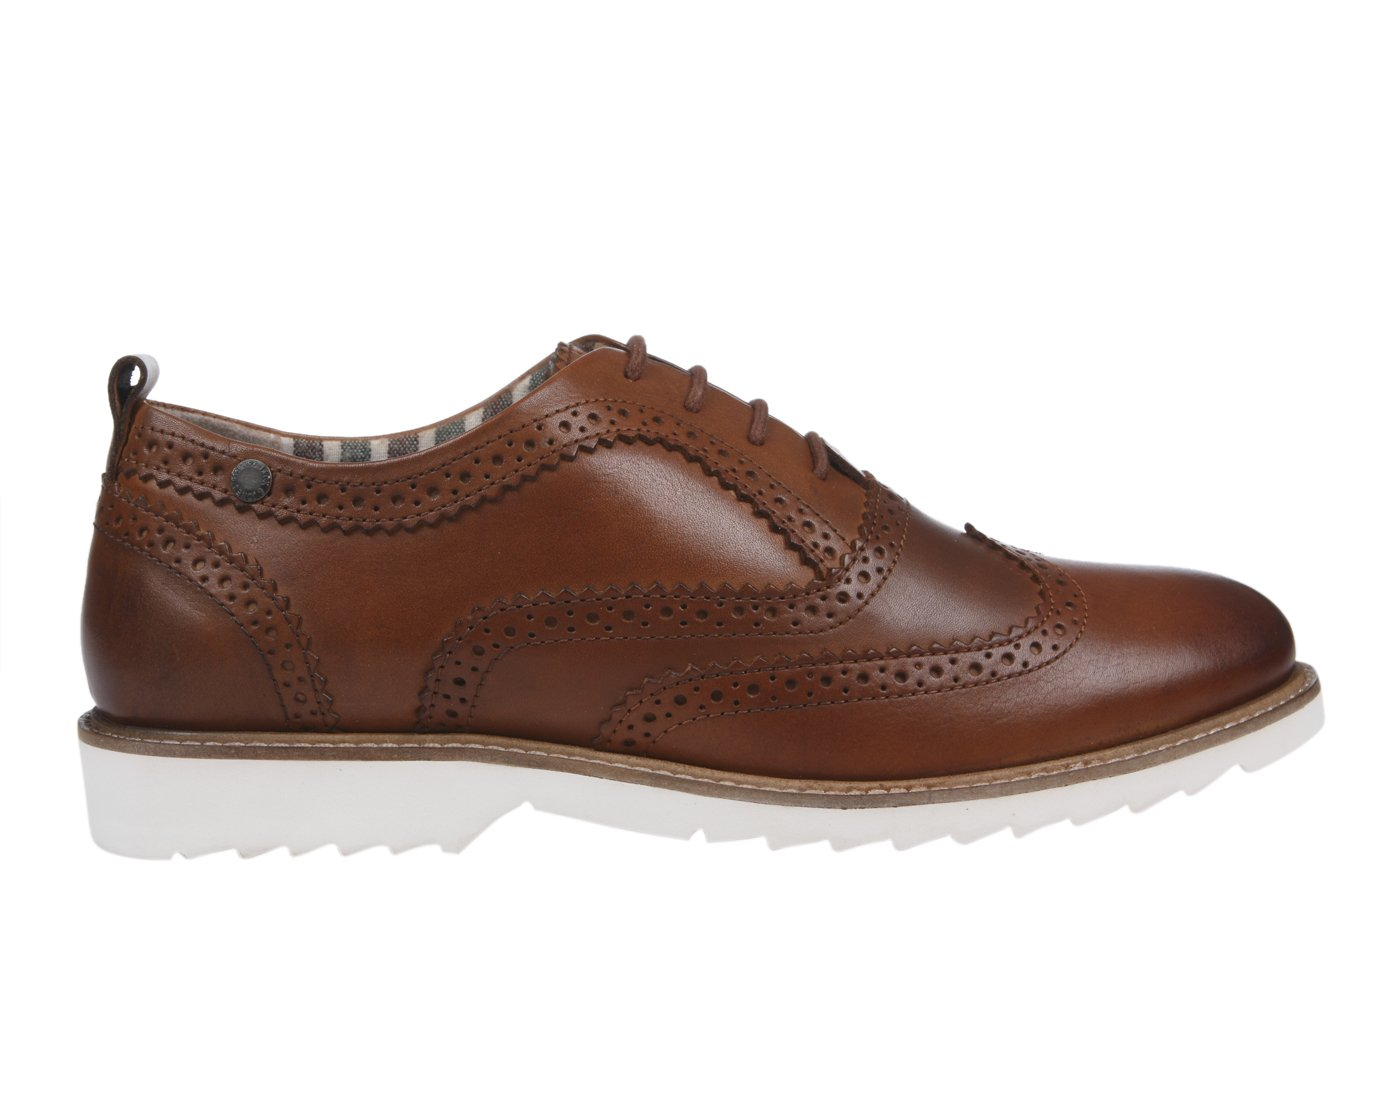 Jack & Jones Men's Formal Shoes product image